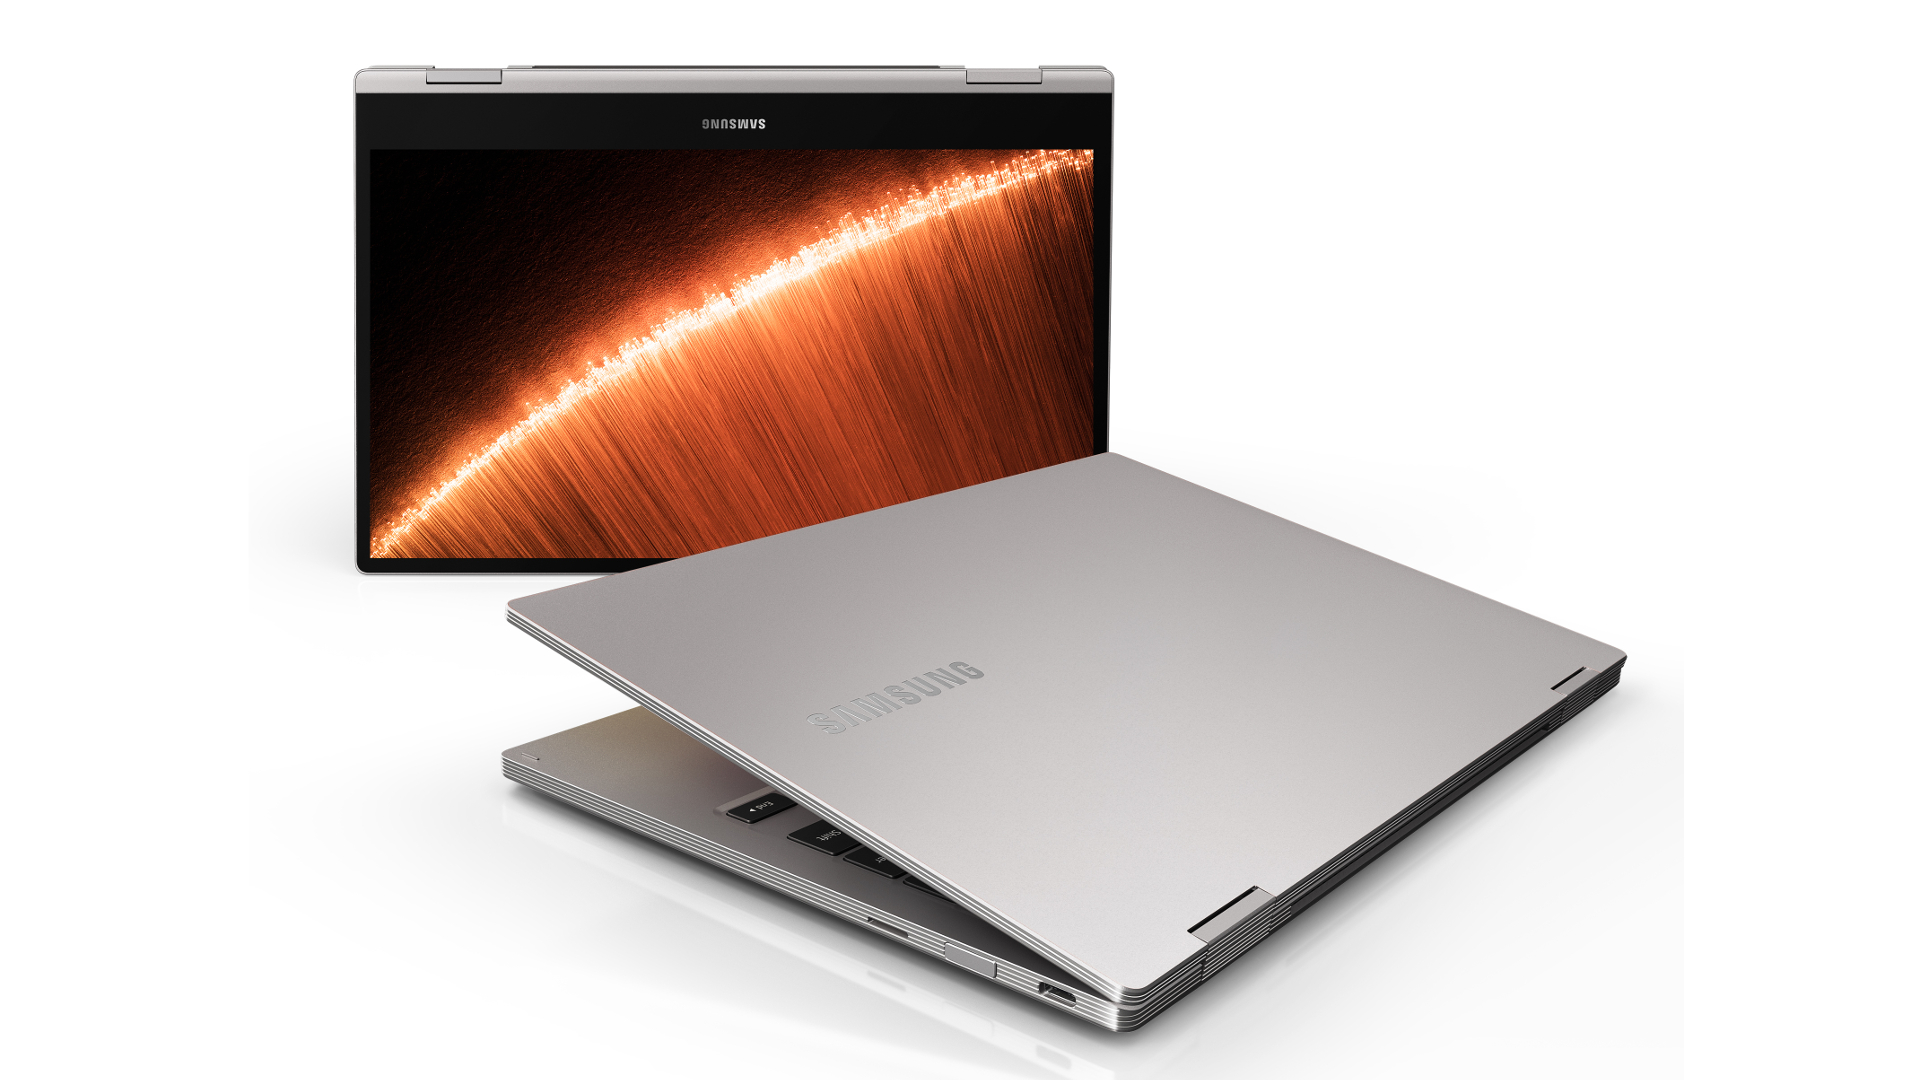 Samsung Notebook 9 Pro gets a sleeker design and beefy 8th-gen Intel processor